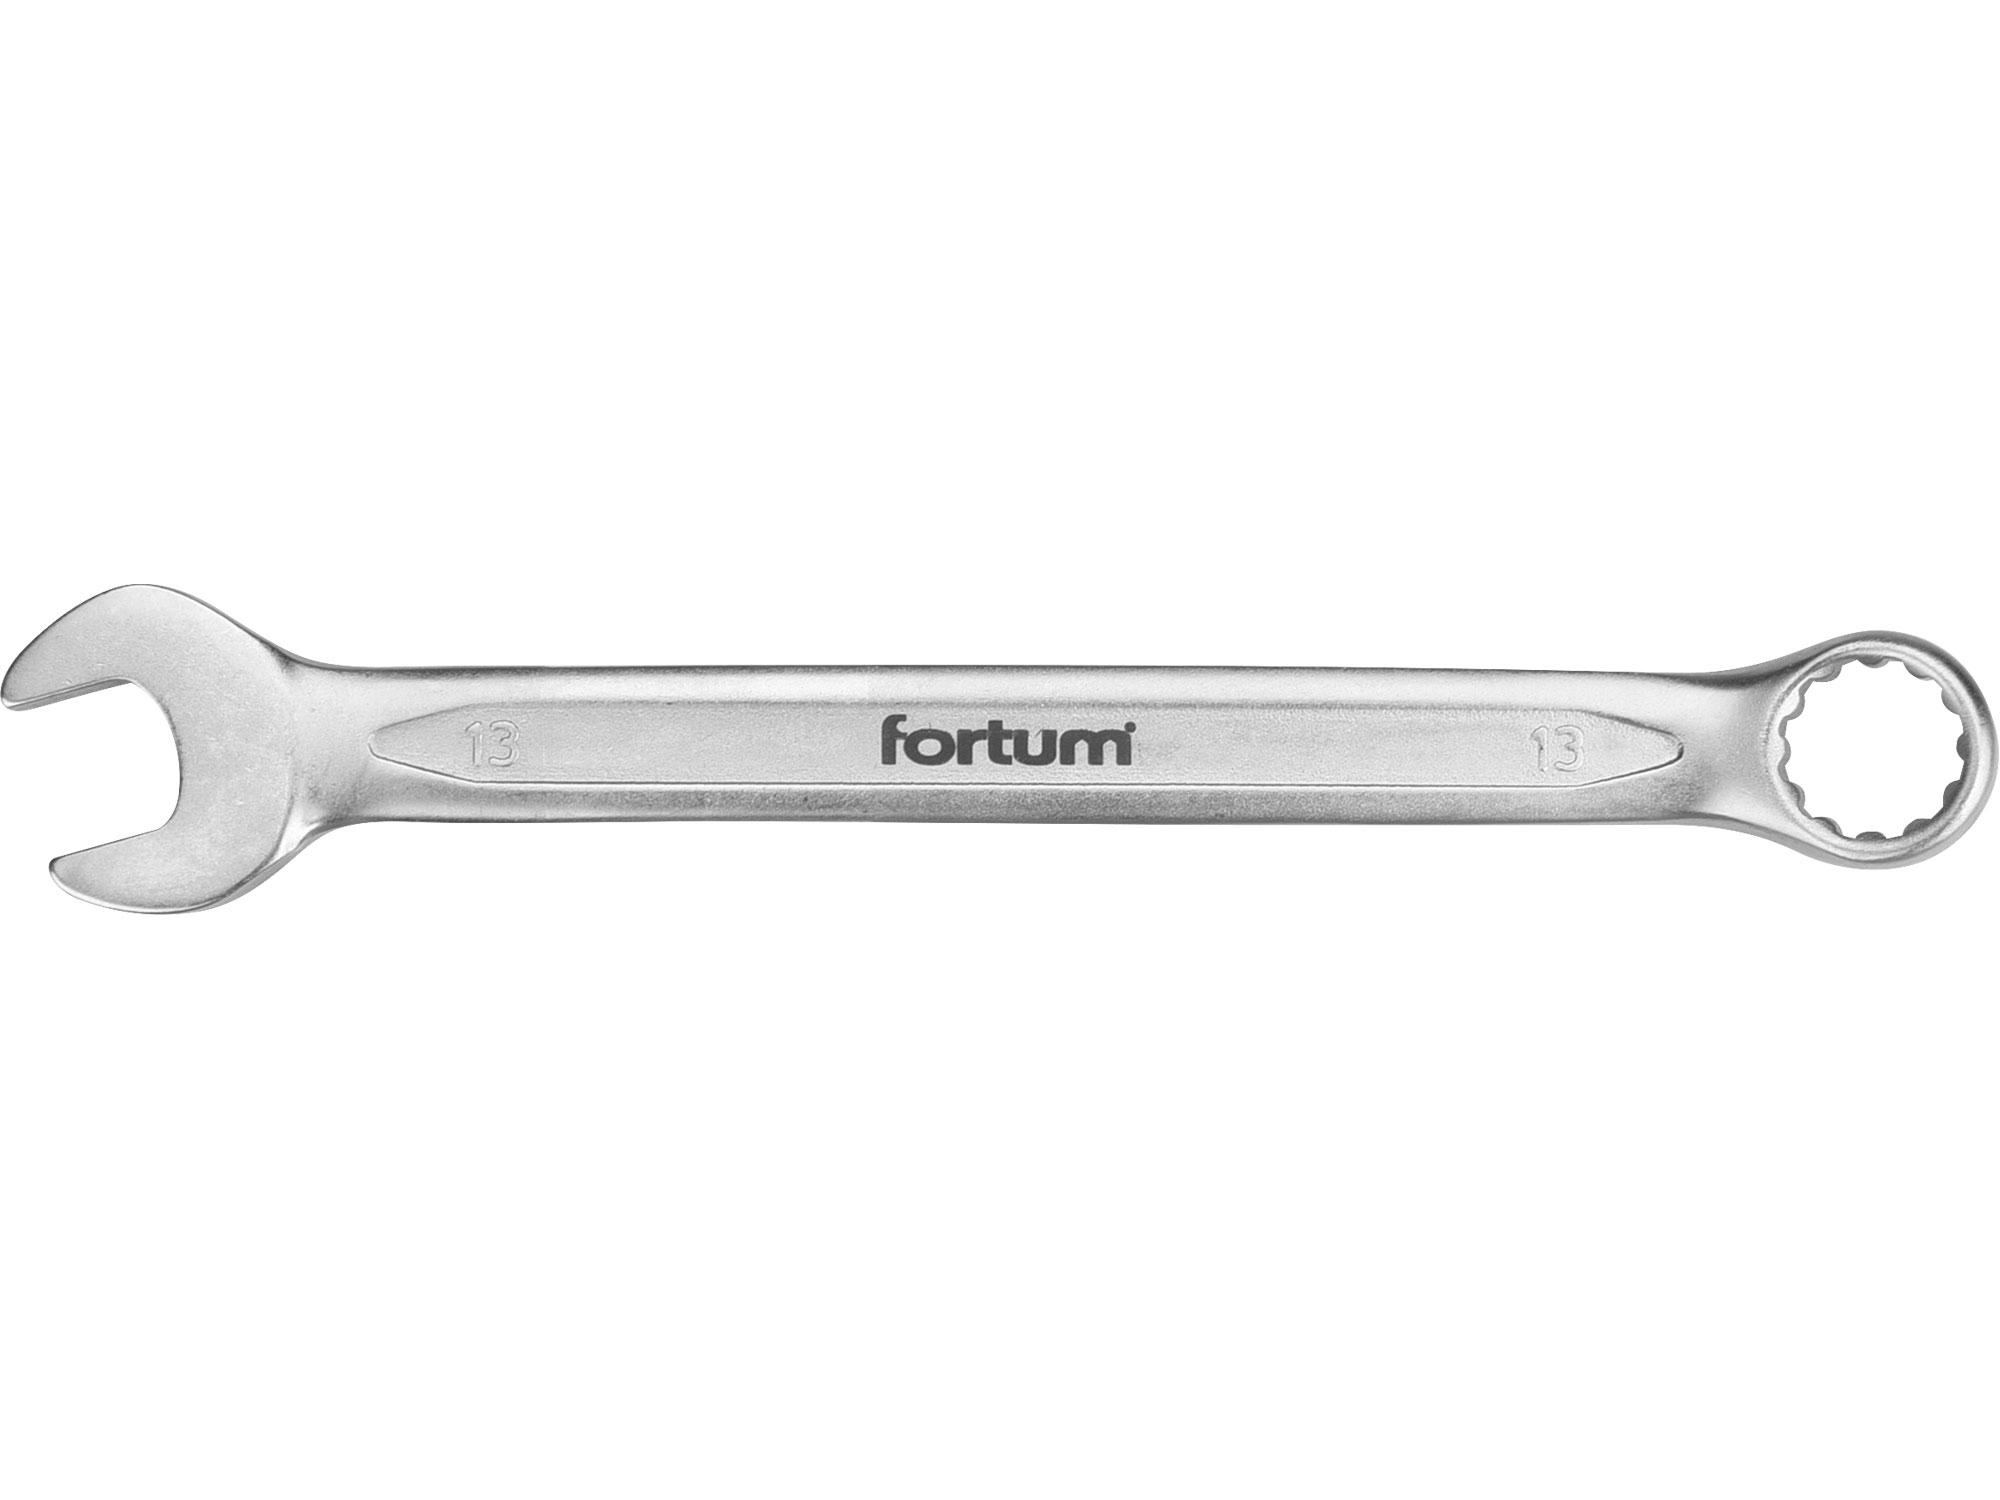 klíč očkoplochý, 13mm, L 181mm, FORTUM 4730213